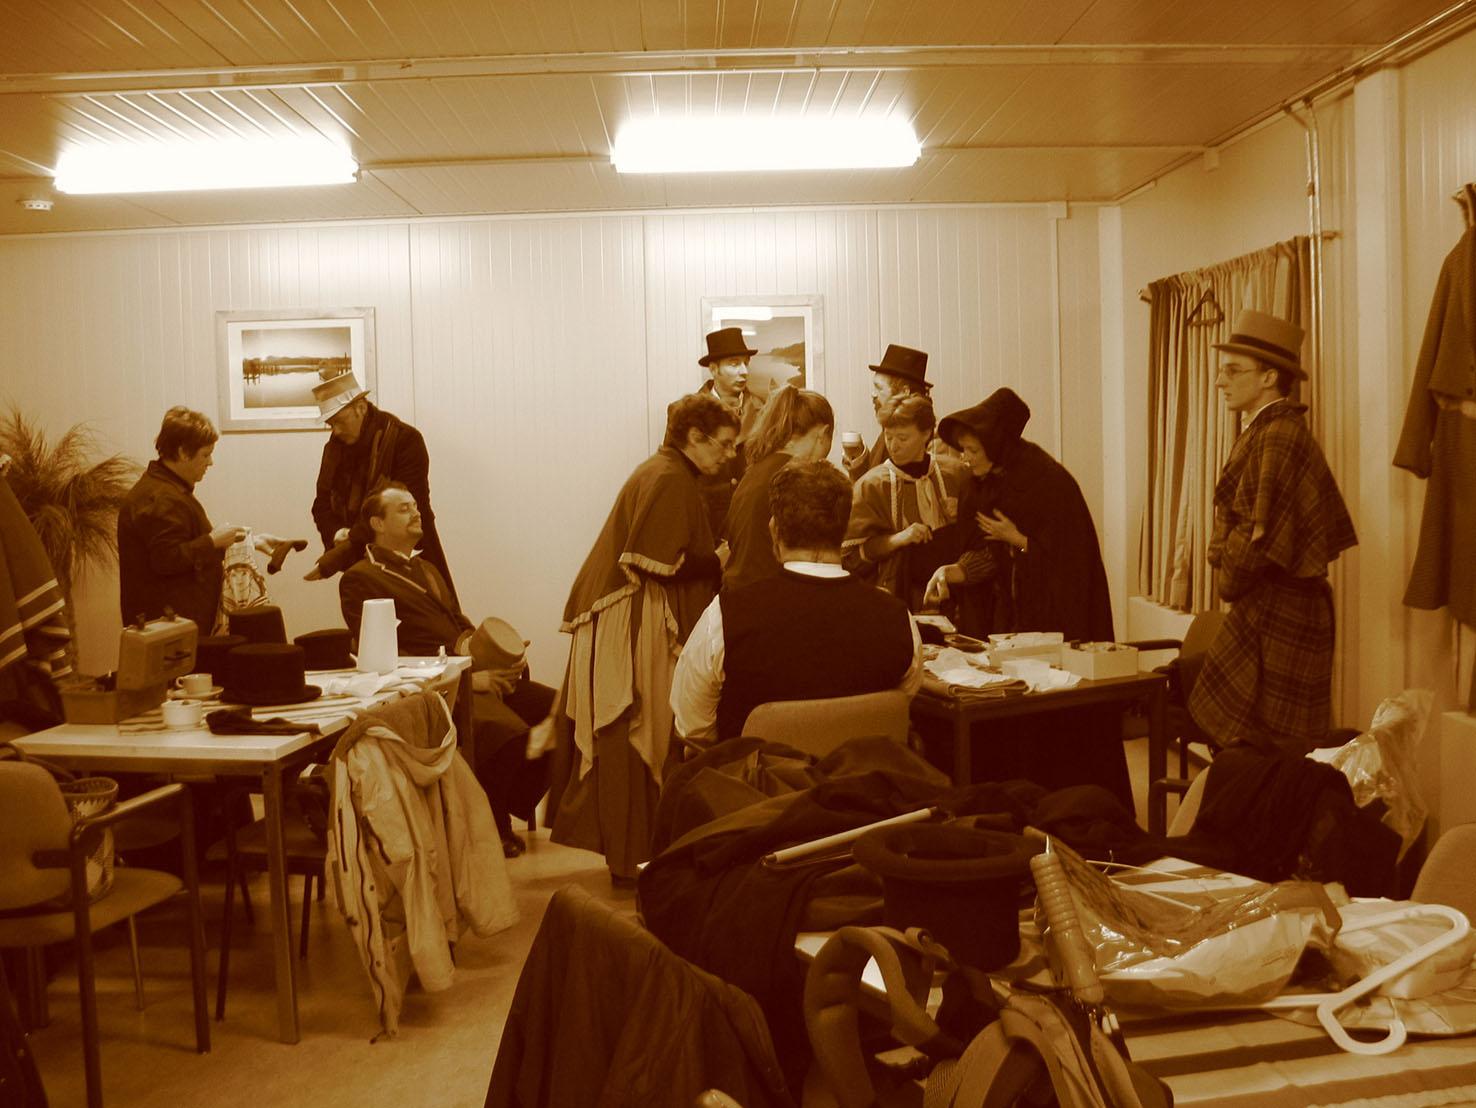 053 - Kerstmarkt Helmond 2003.jpg